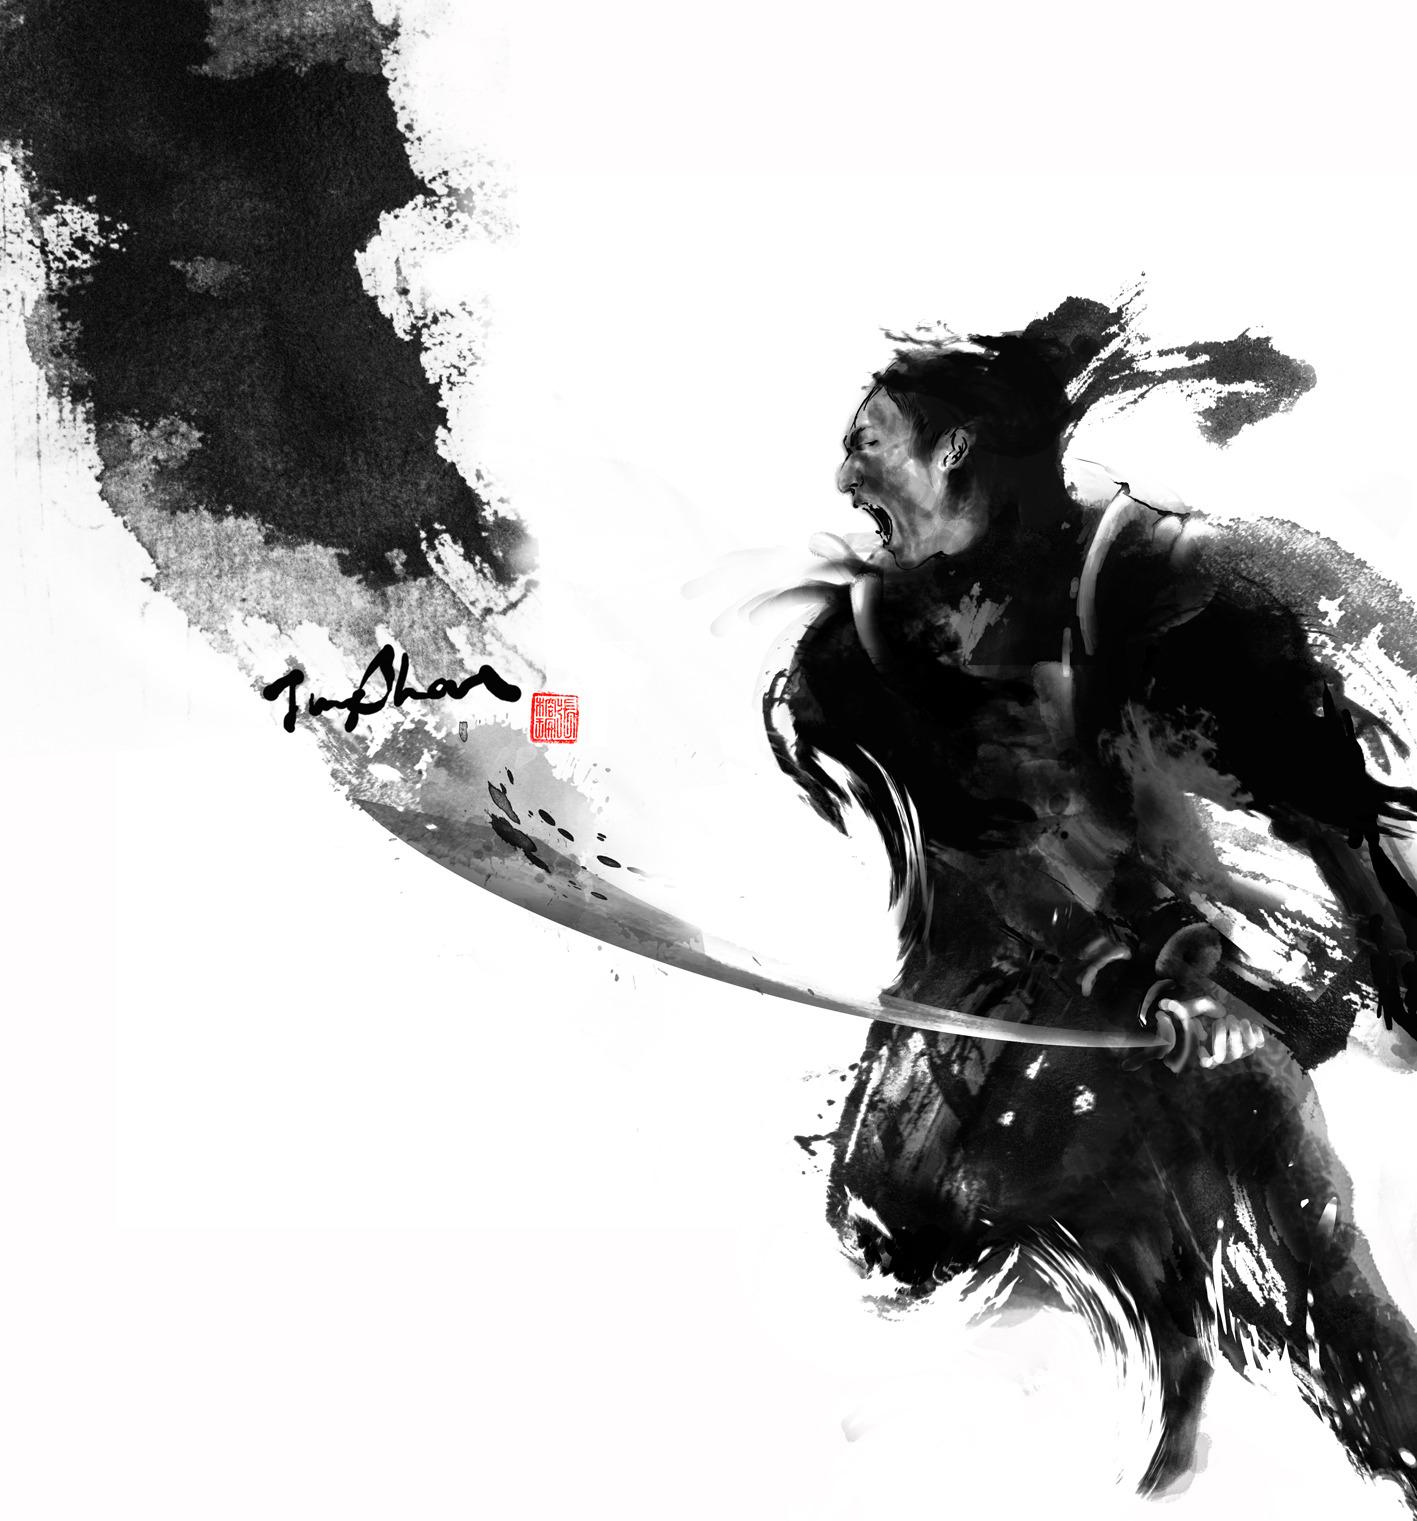 Drawn samurai ink #art graceful powerful is #samurai